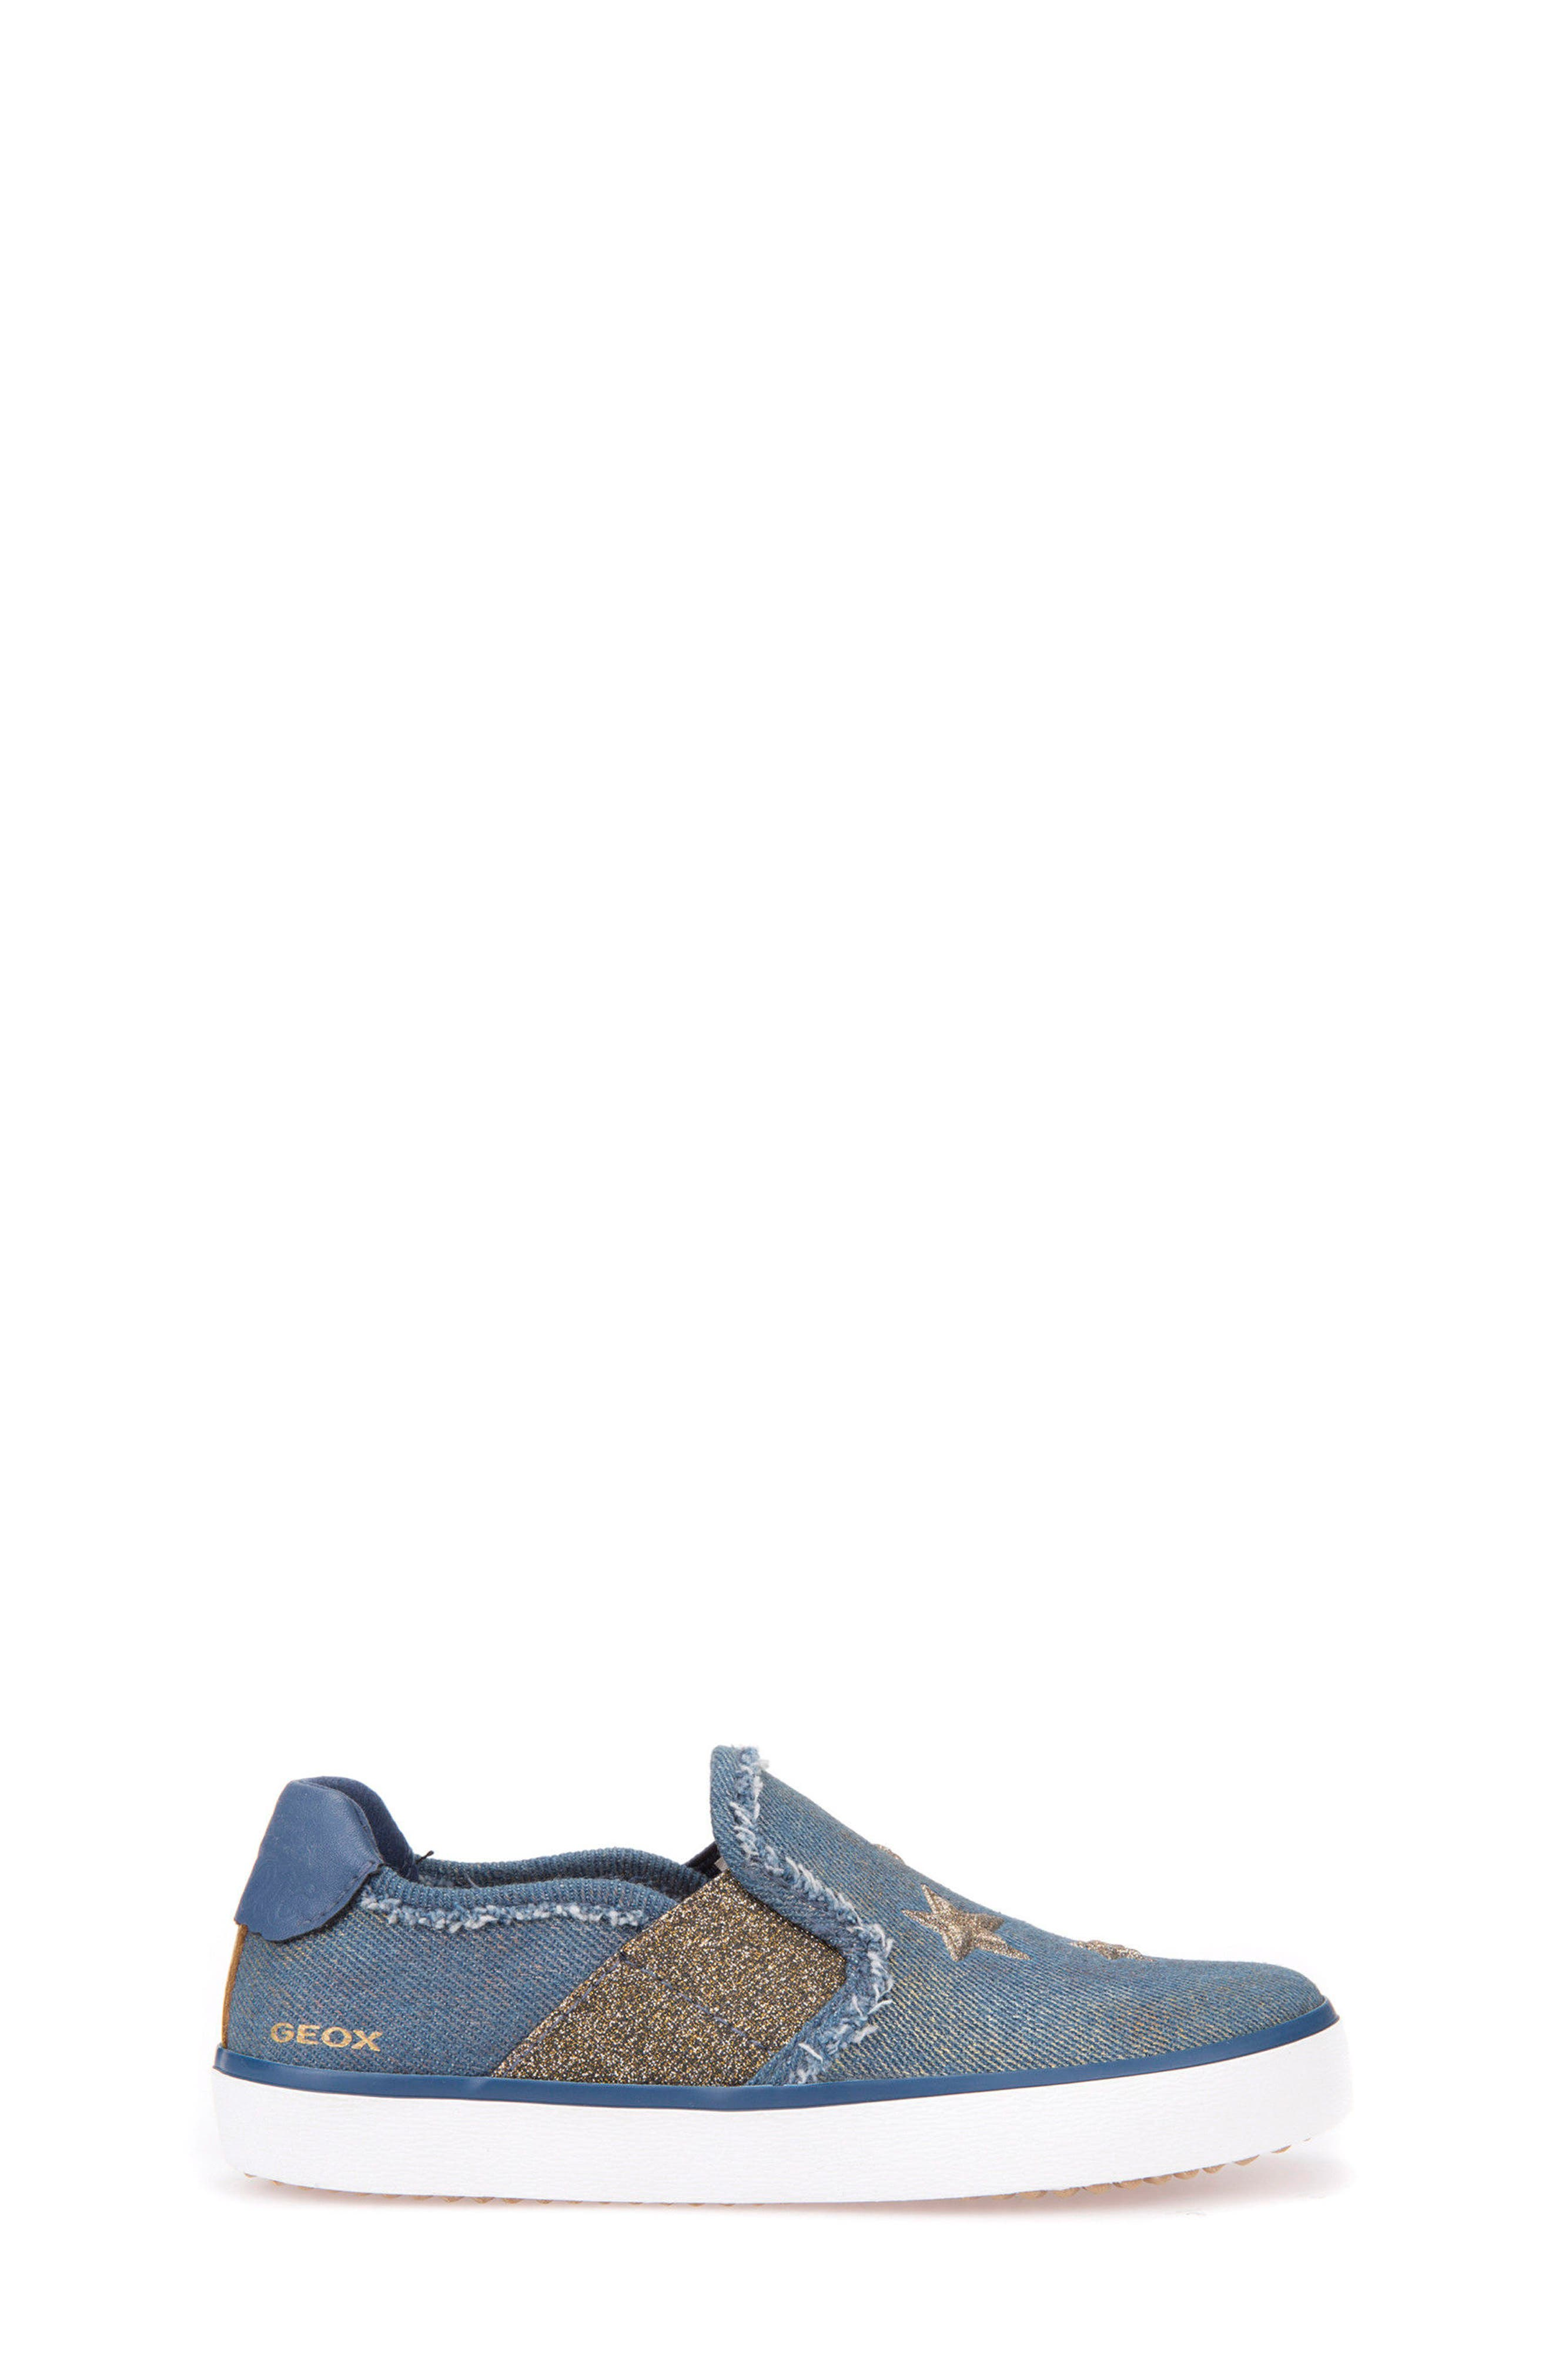 Kilwi Slip-On Sneaker,                             Alternate thumbnail 3, color,                             AVIO